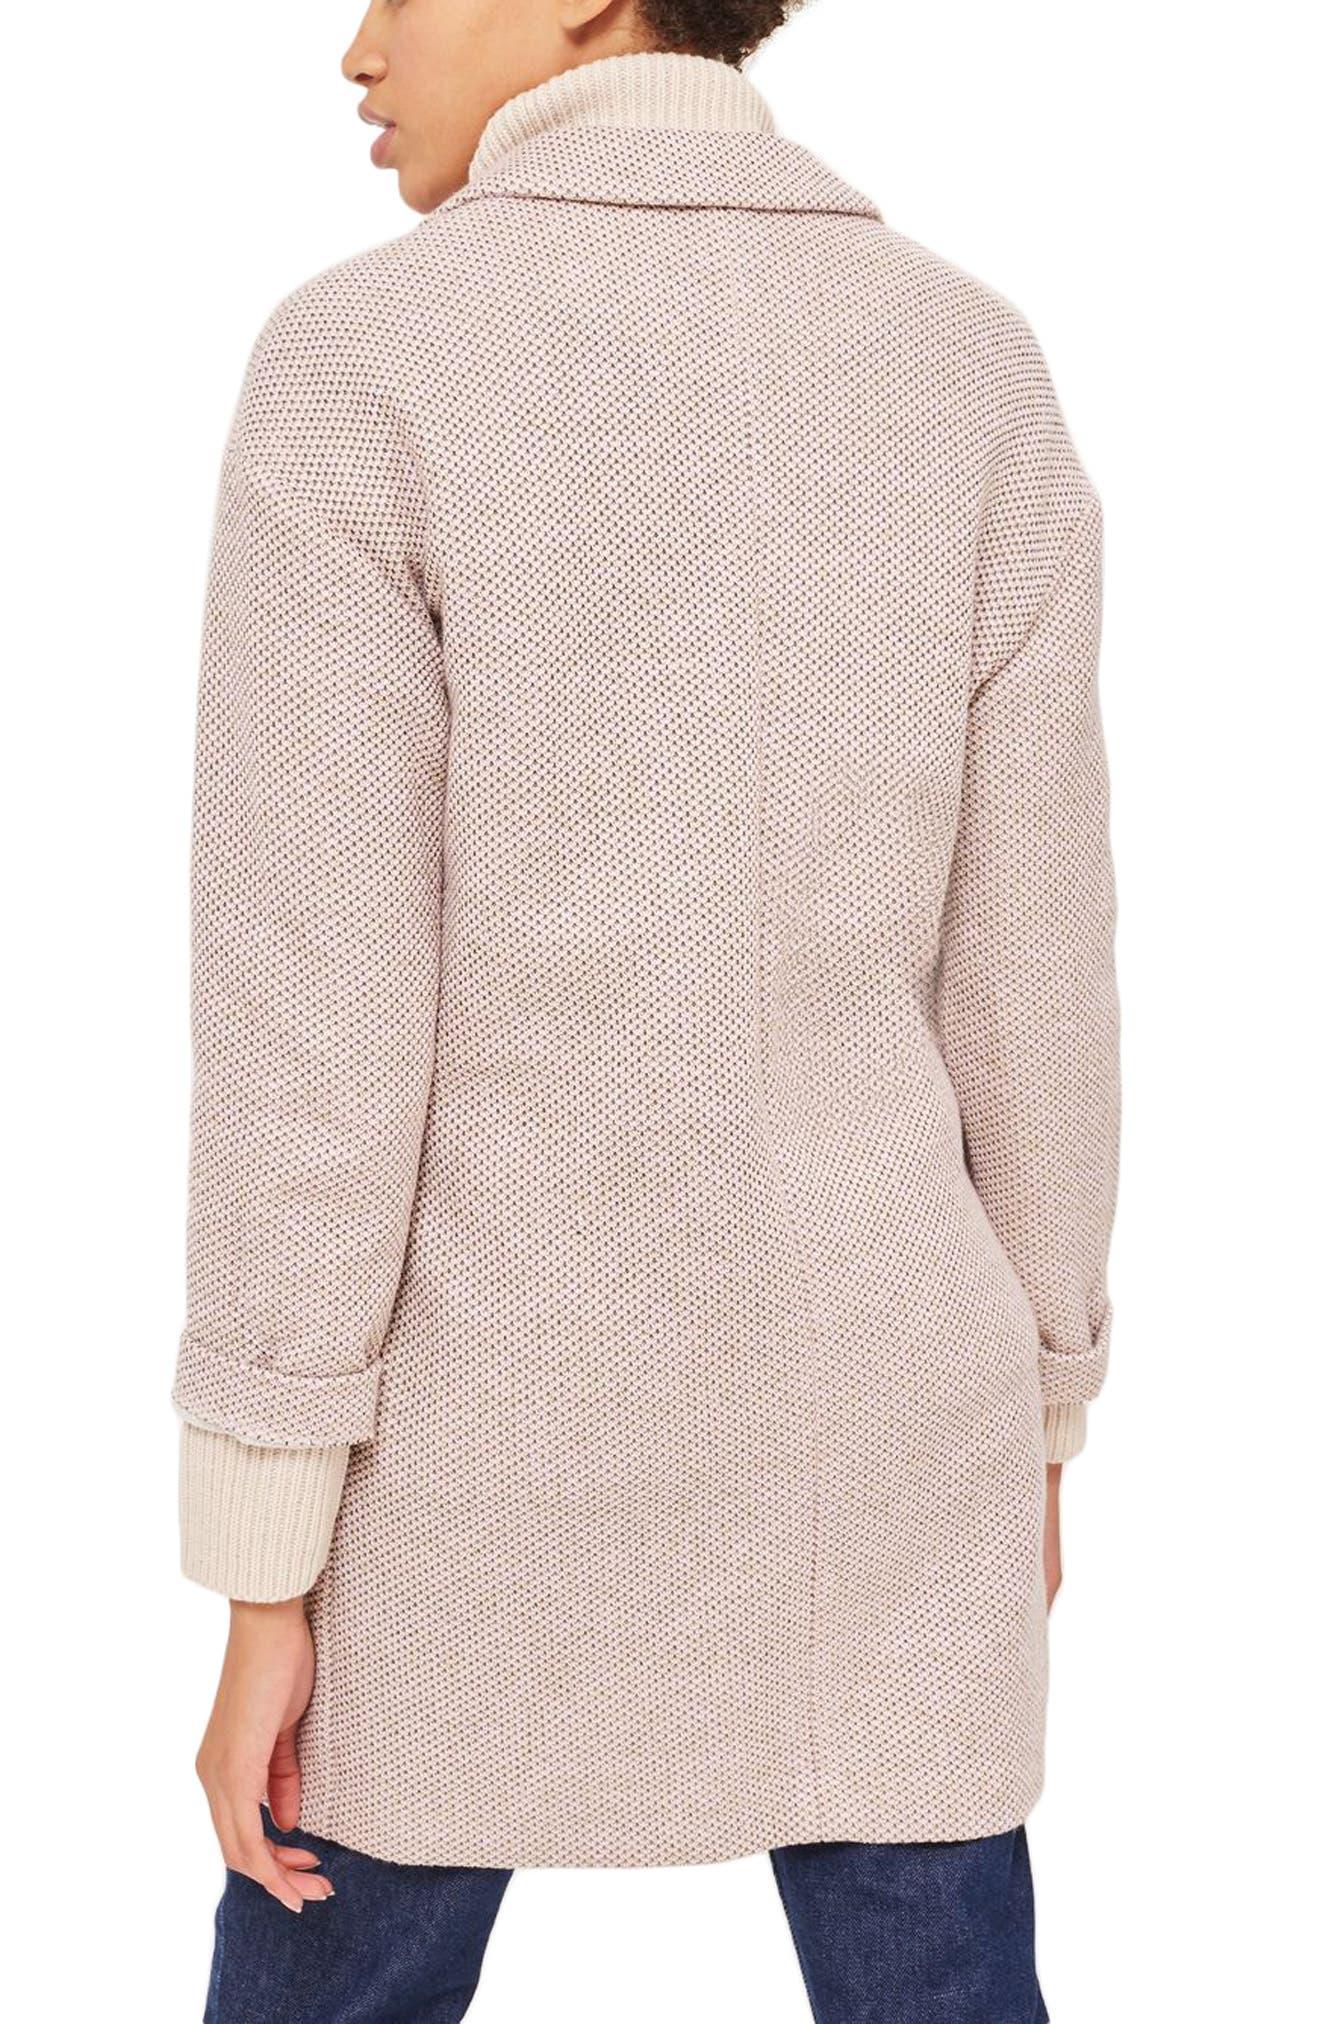 Textured Knit Coat,                             Alternate thumbnail 2, color,                             250